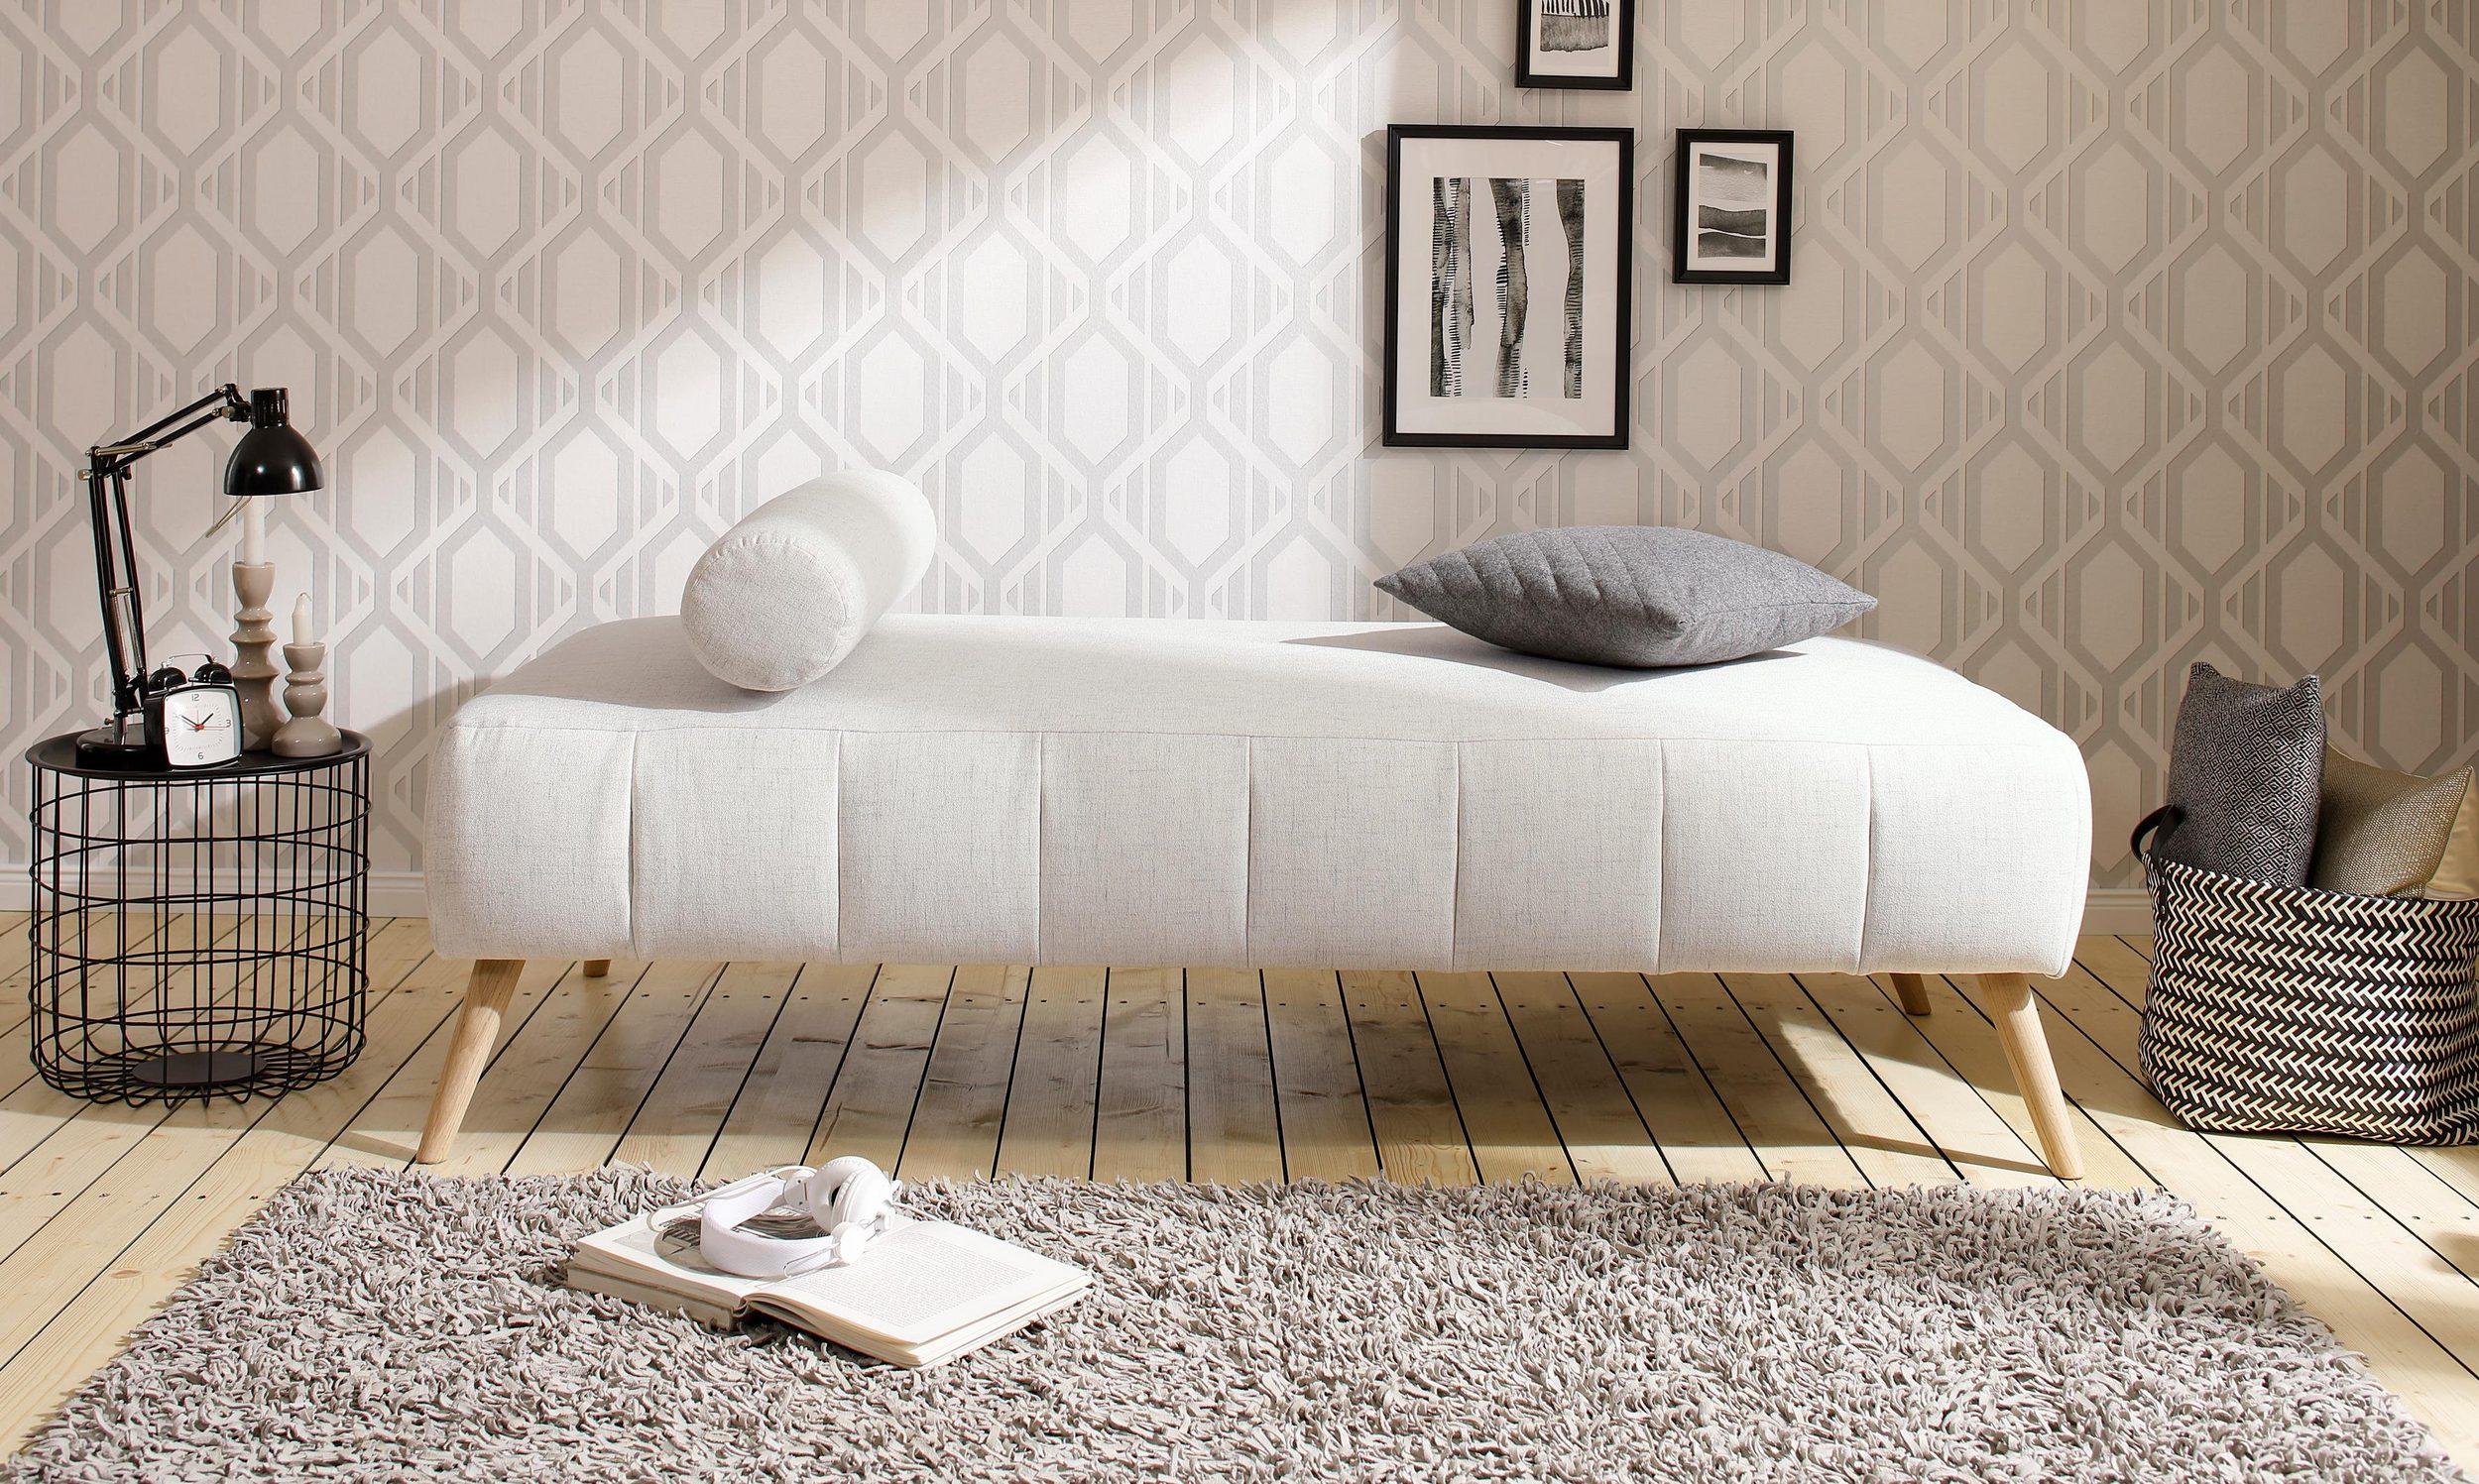 49 sparen home affaire liegesofa lucy nur 229 99 cherry m bel otto. Black Bedroom Furniture Sets. Home Design Ideas